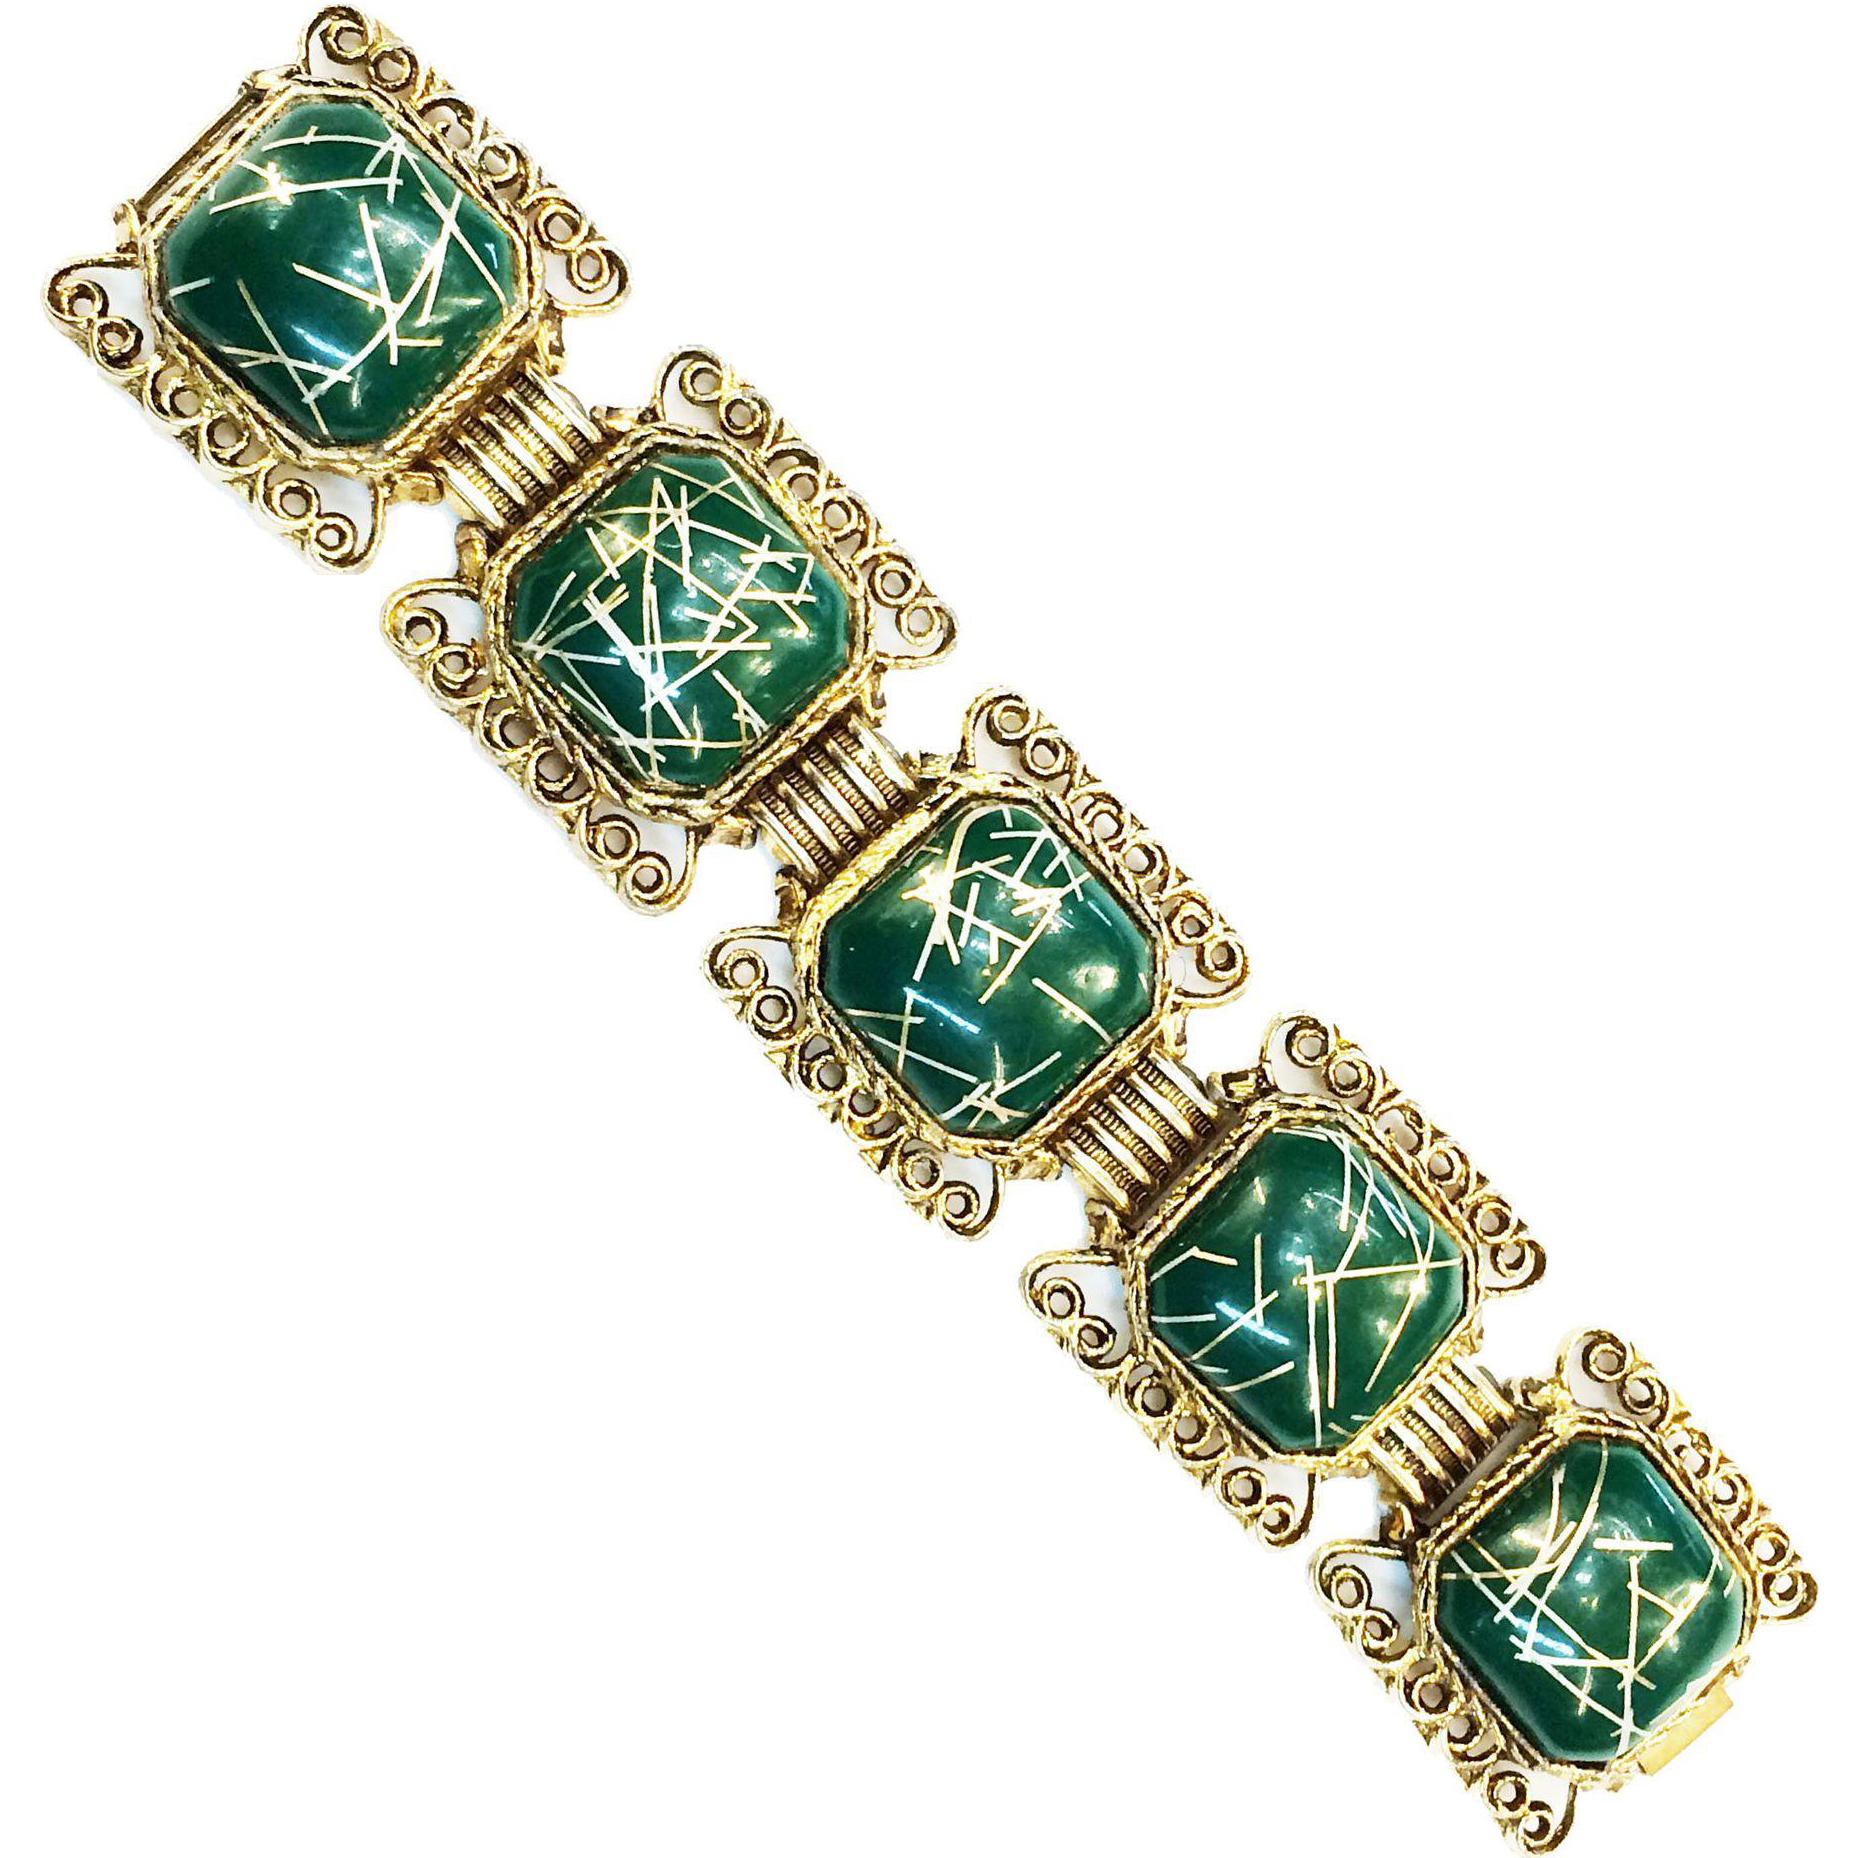 1950s Confetti Lucite Green Gilt Link Bracelet